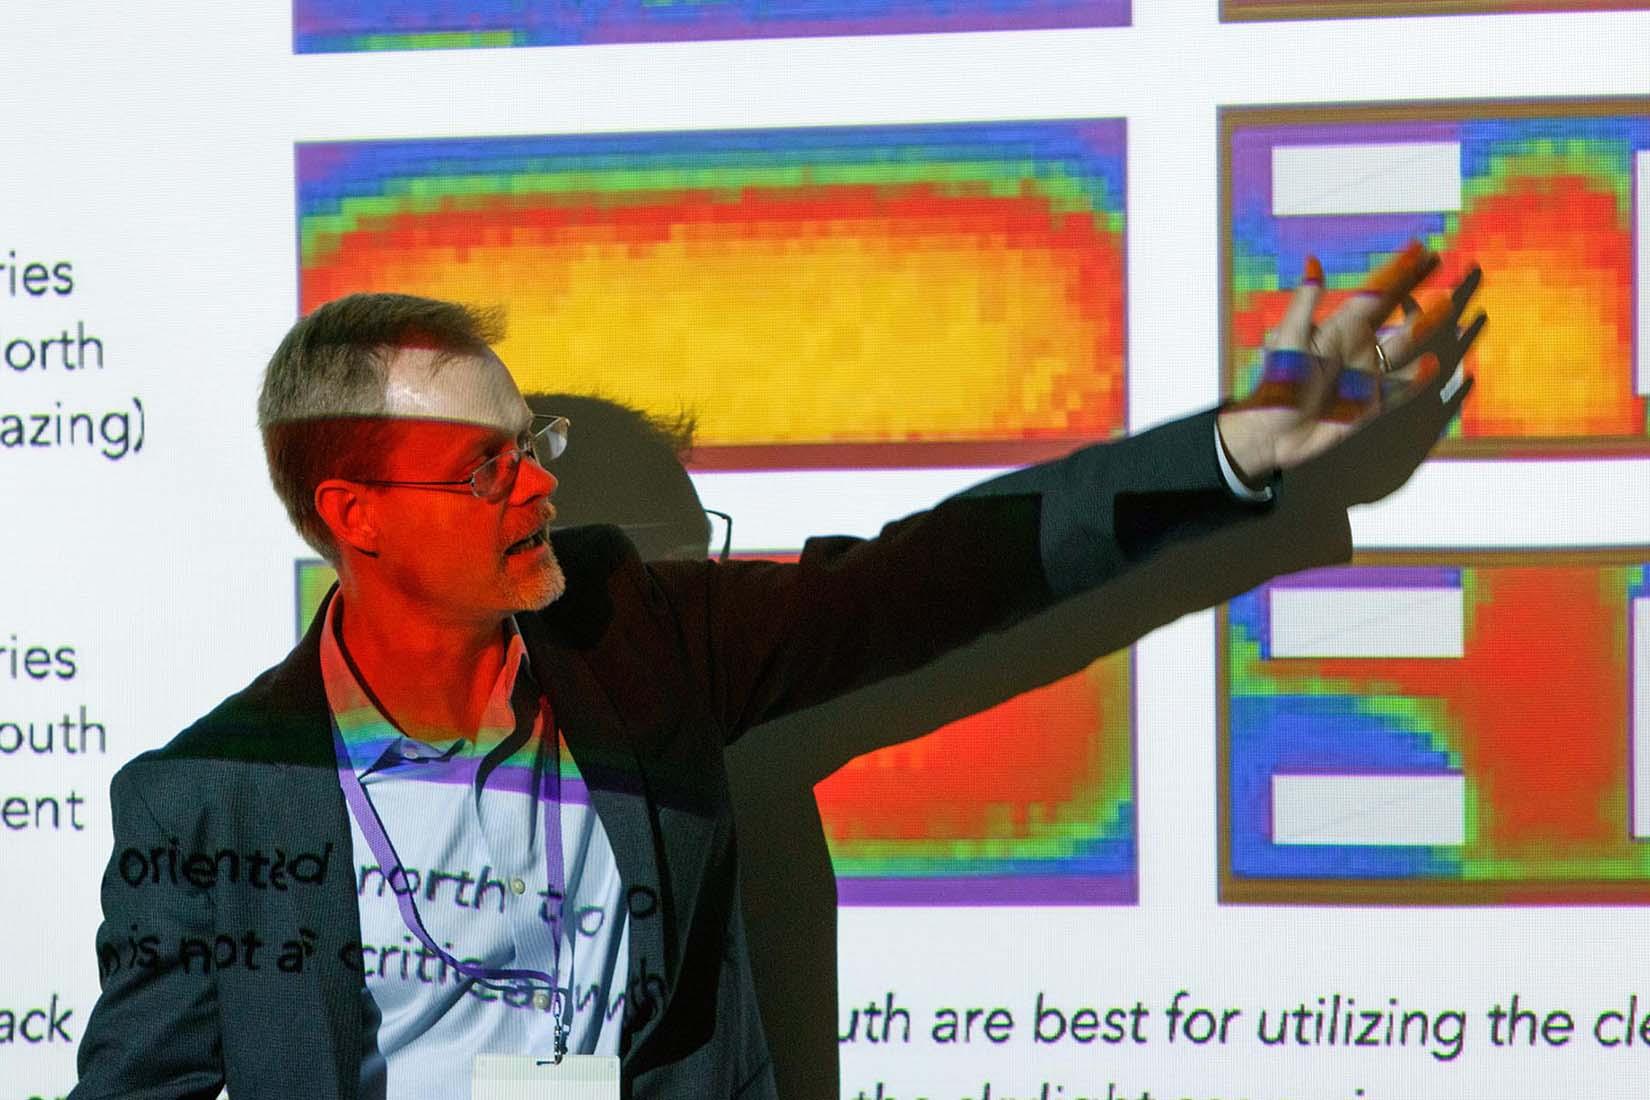 speaker pointing at the slideshow